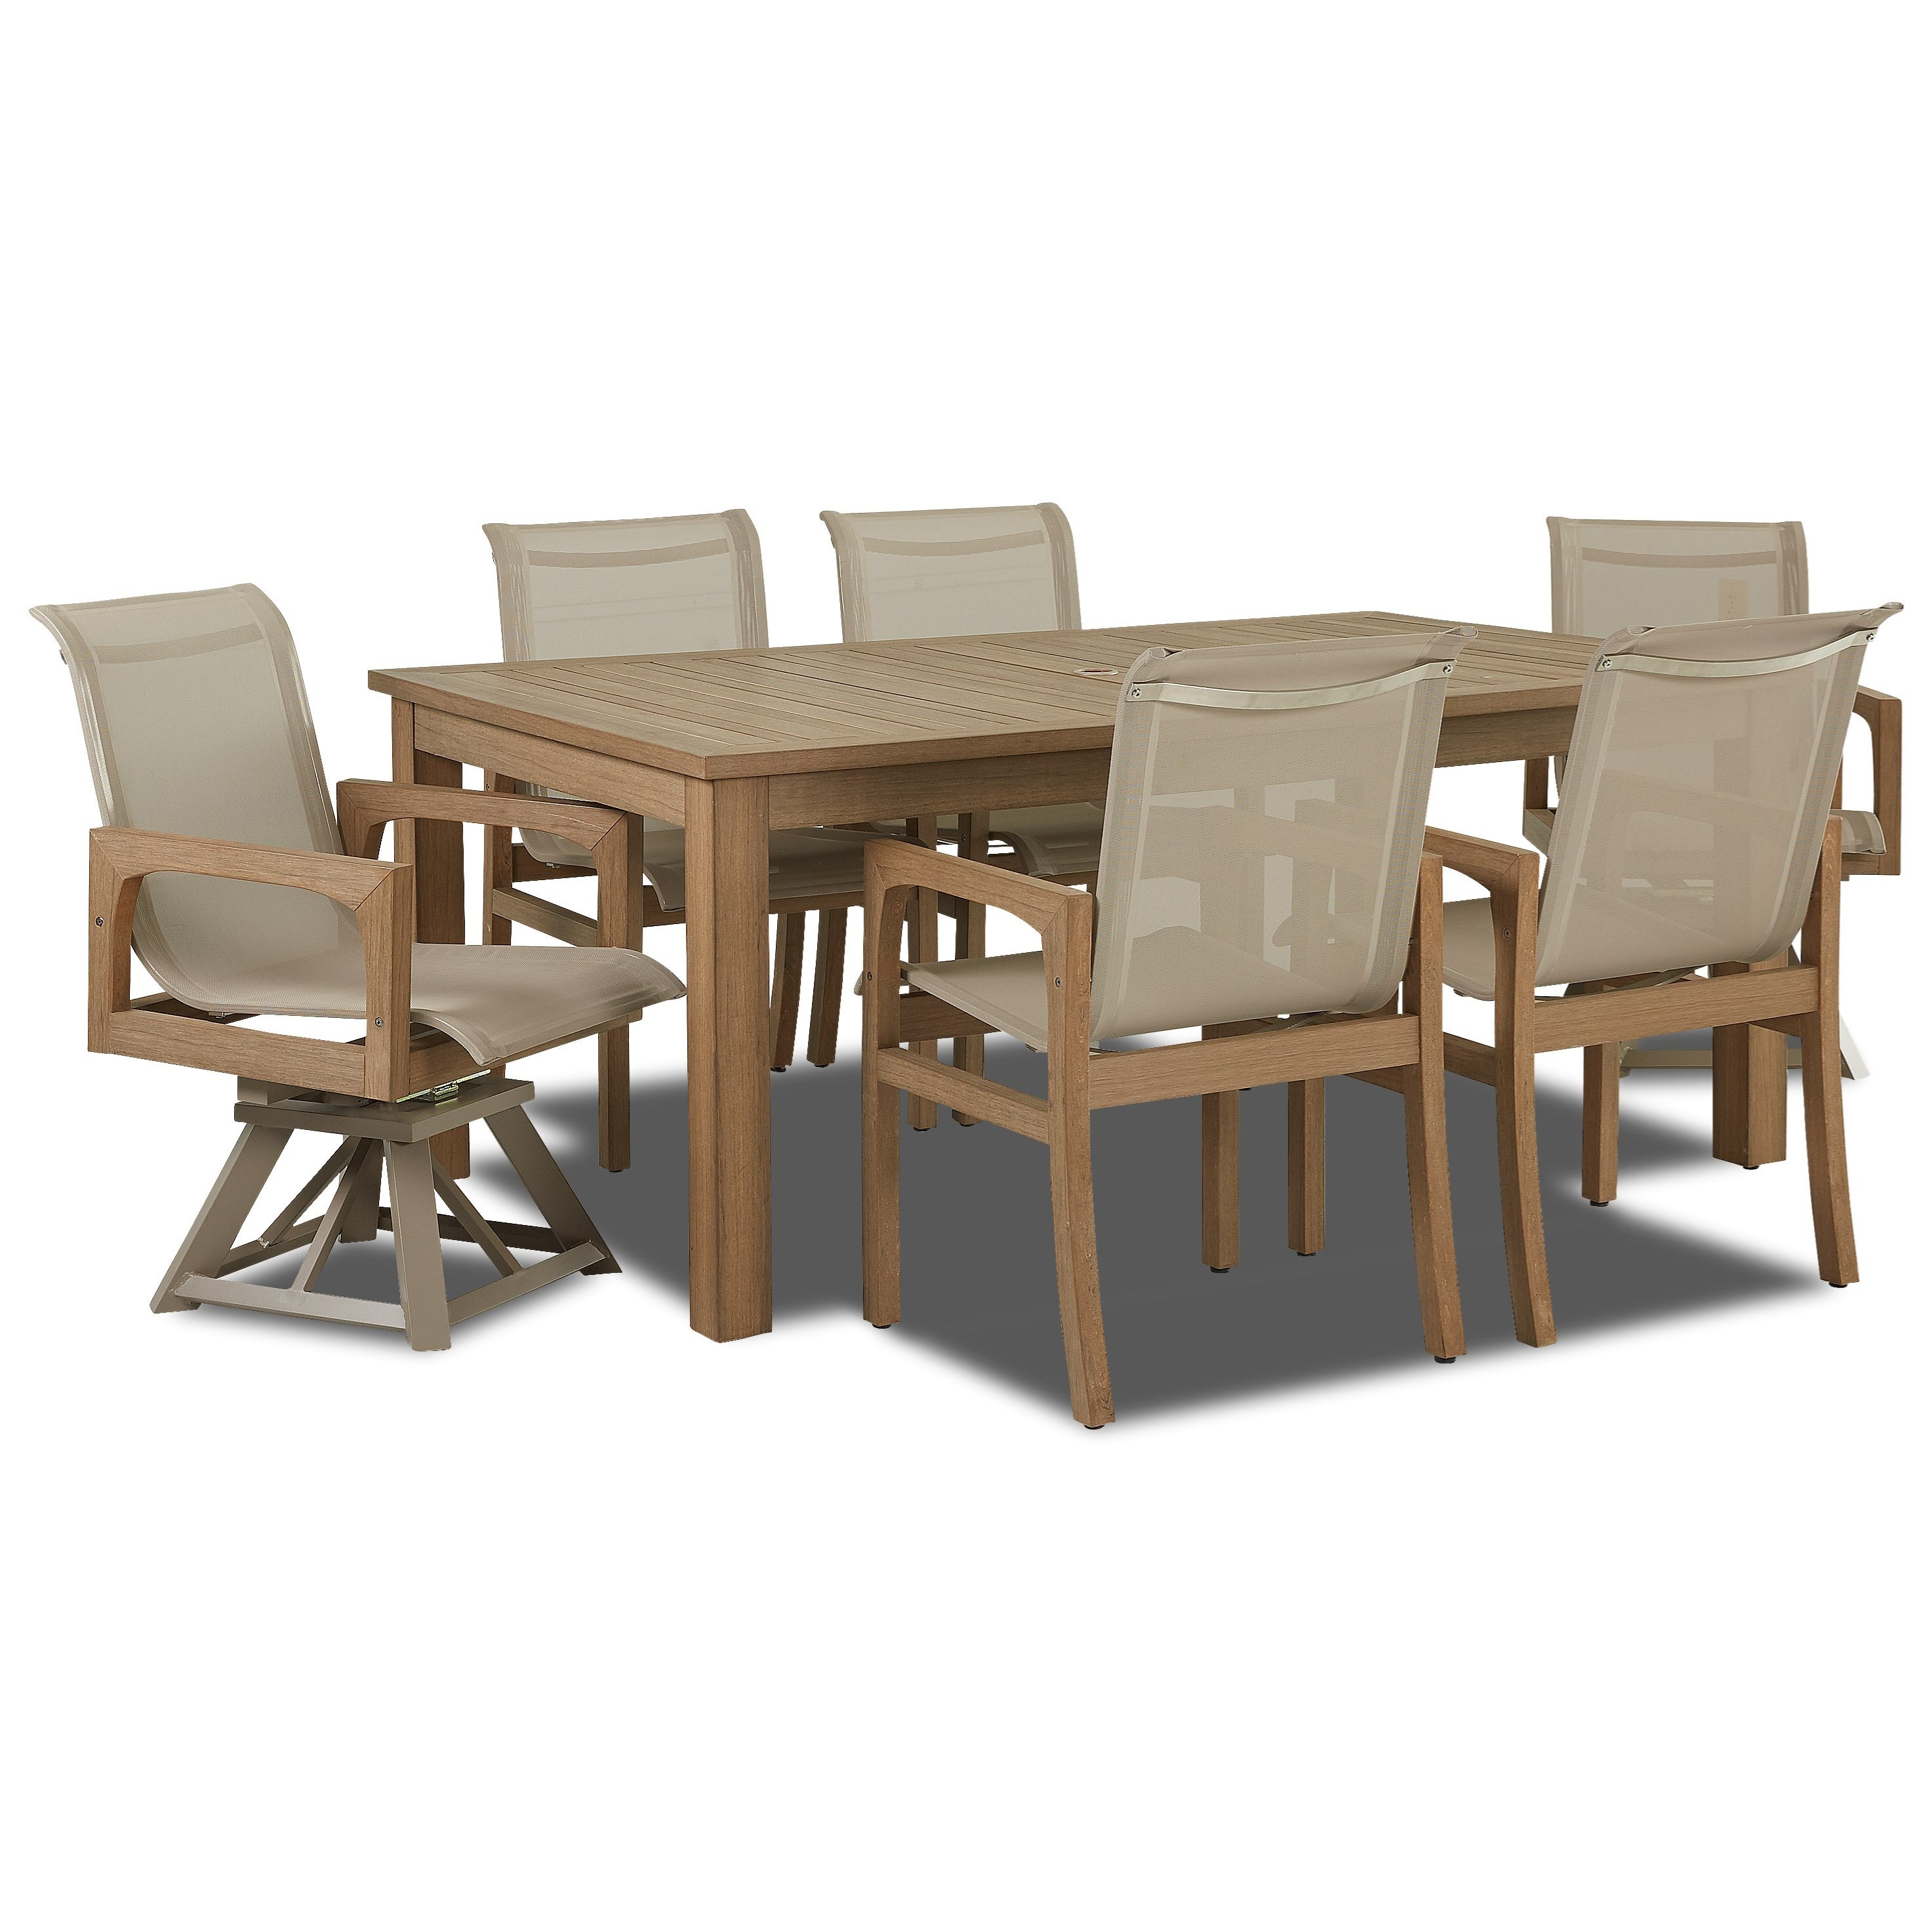 Klaussner Outdoor Delray 7 Piece Outdoor Dining Set Design Interiors Outdoor Dining Sets